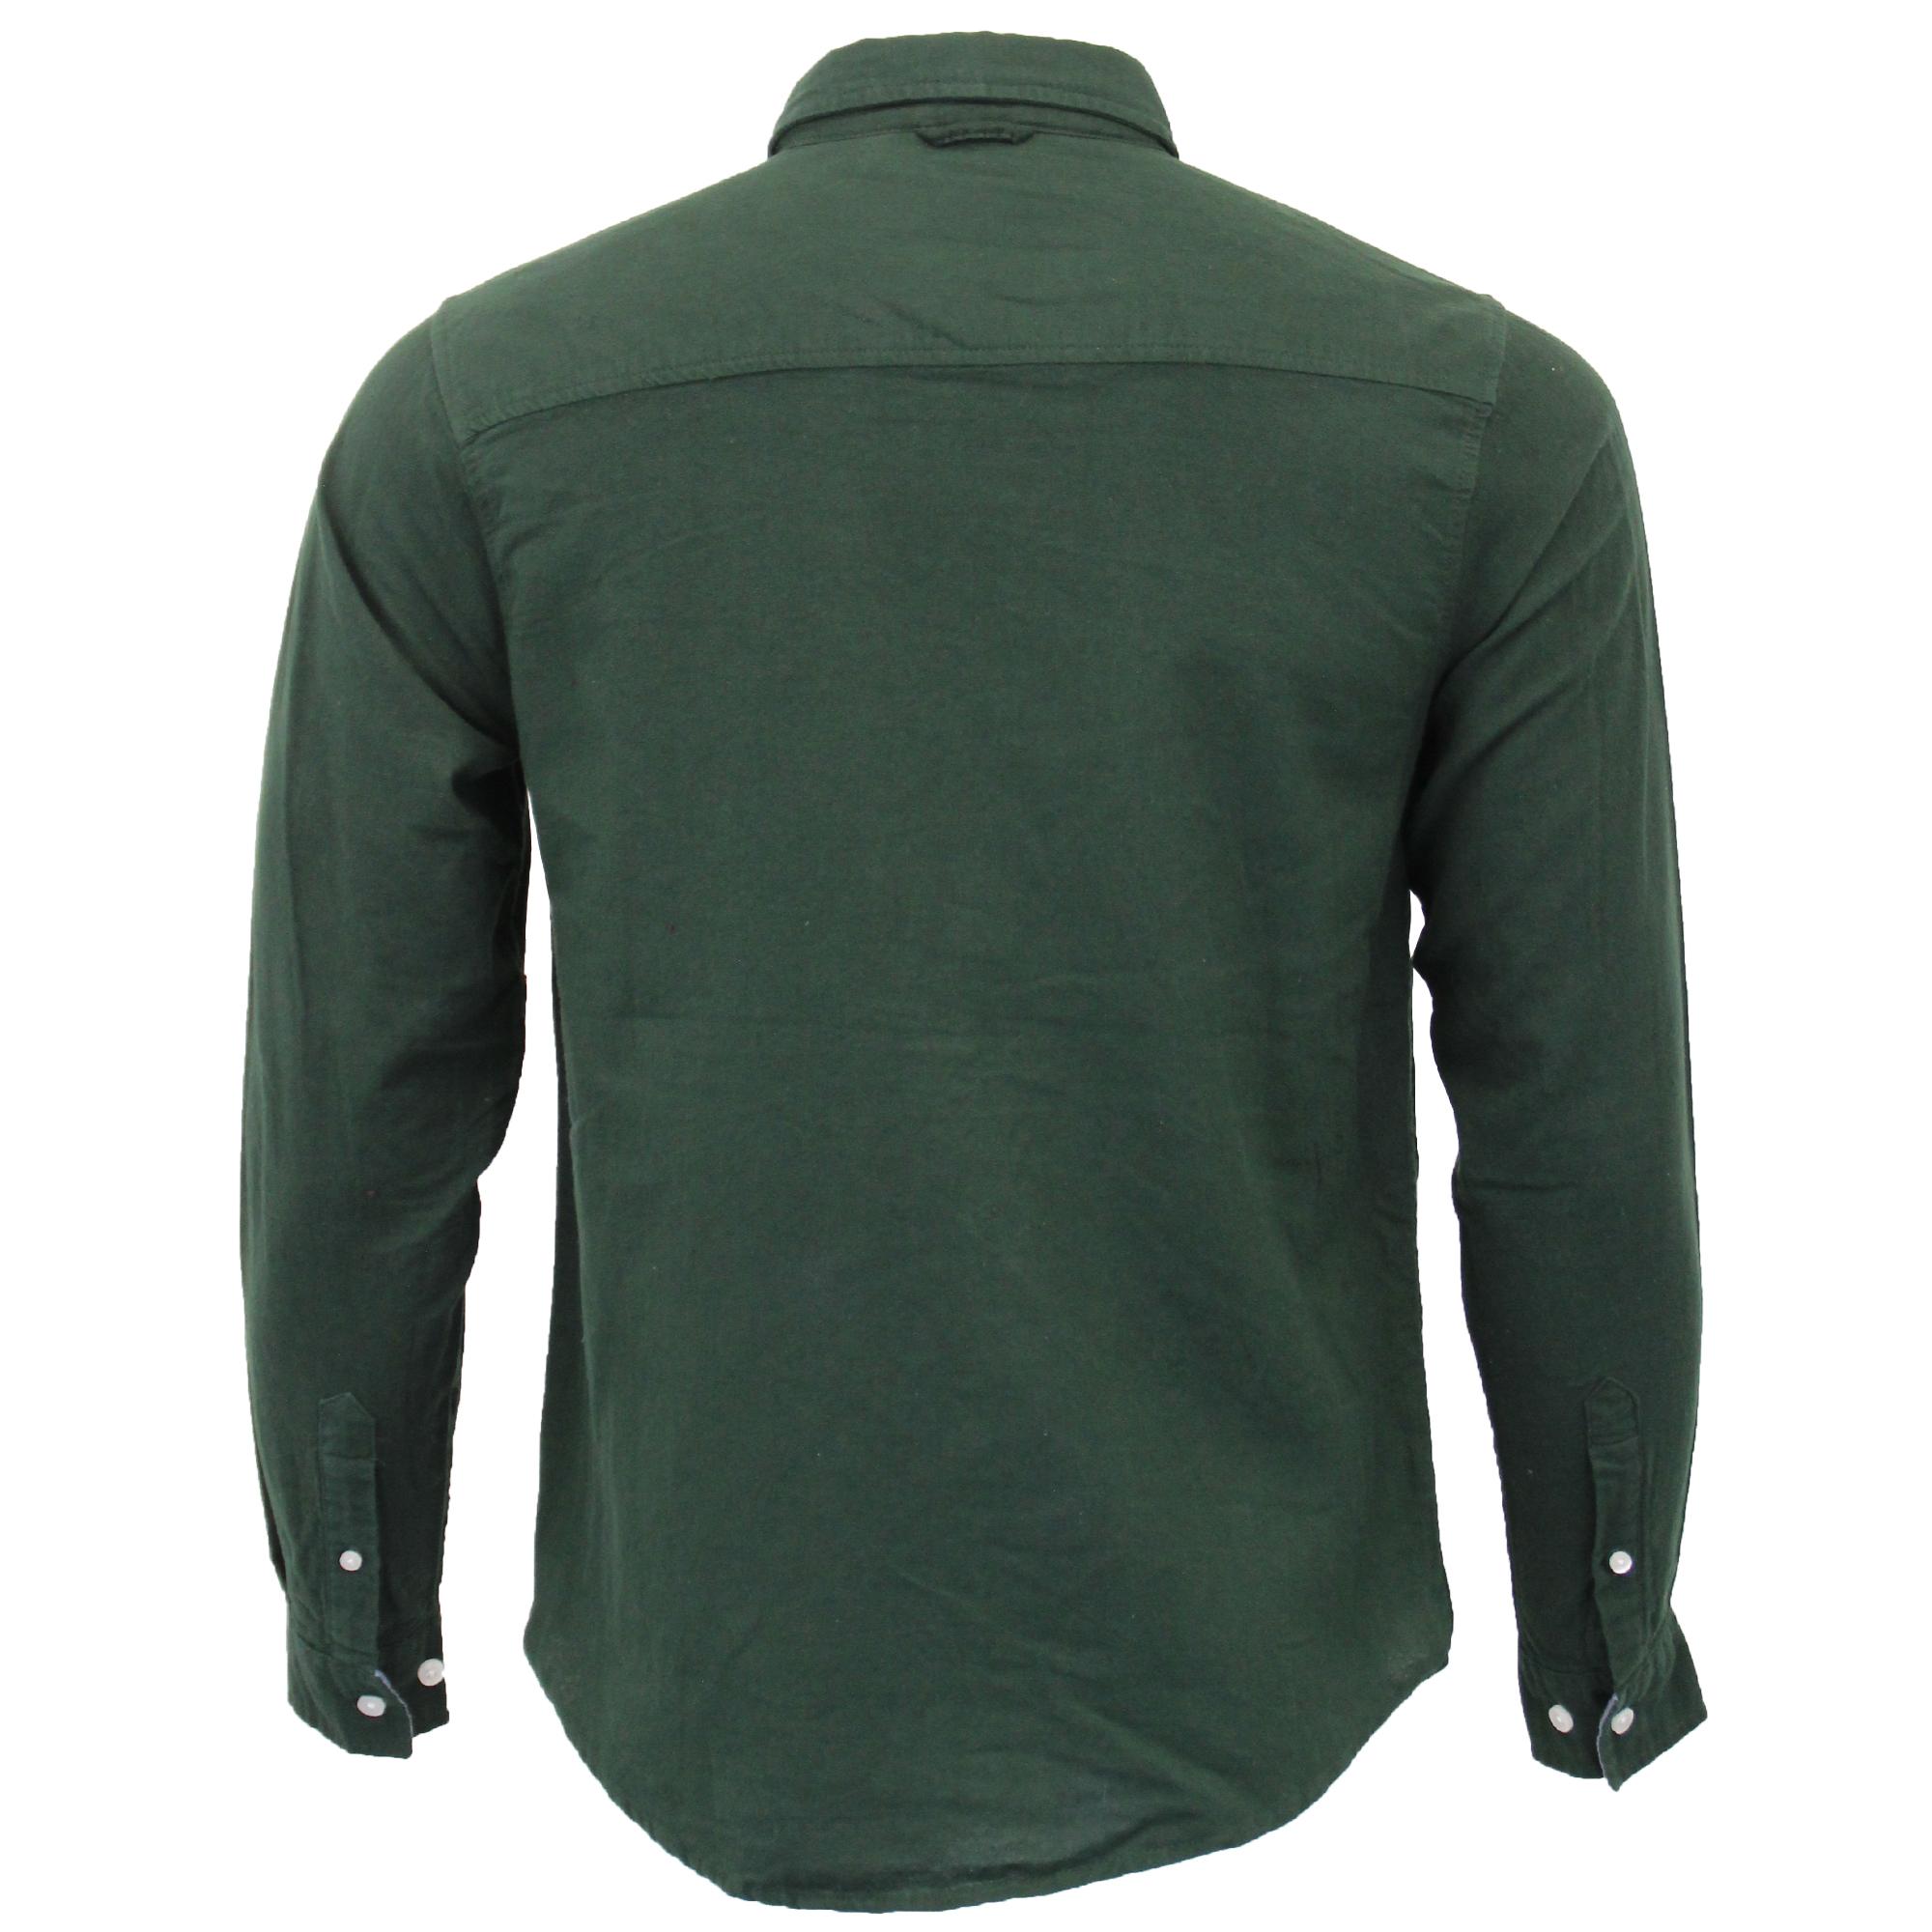 Mens-Brushed-Cotton-Shirt-Brave-Soul-Long-Sleeved-Flannel-HOLMES-Casual-Designer thumbnail 12